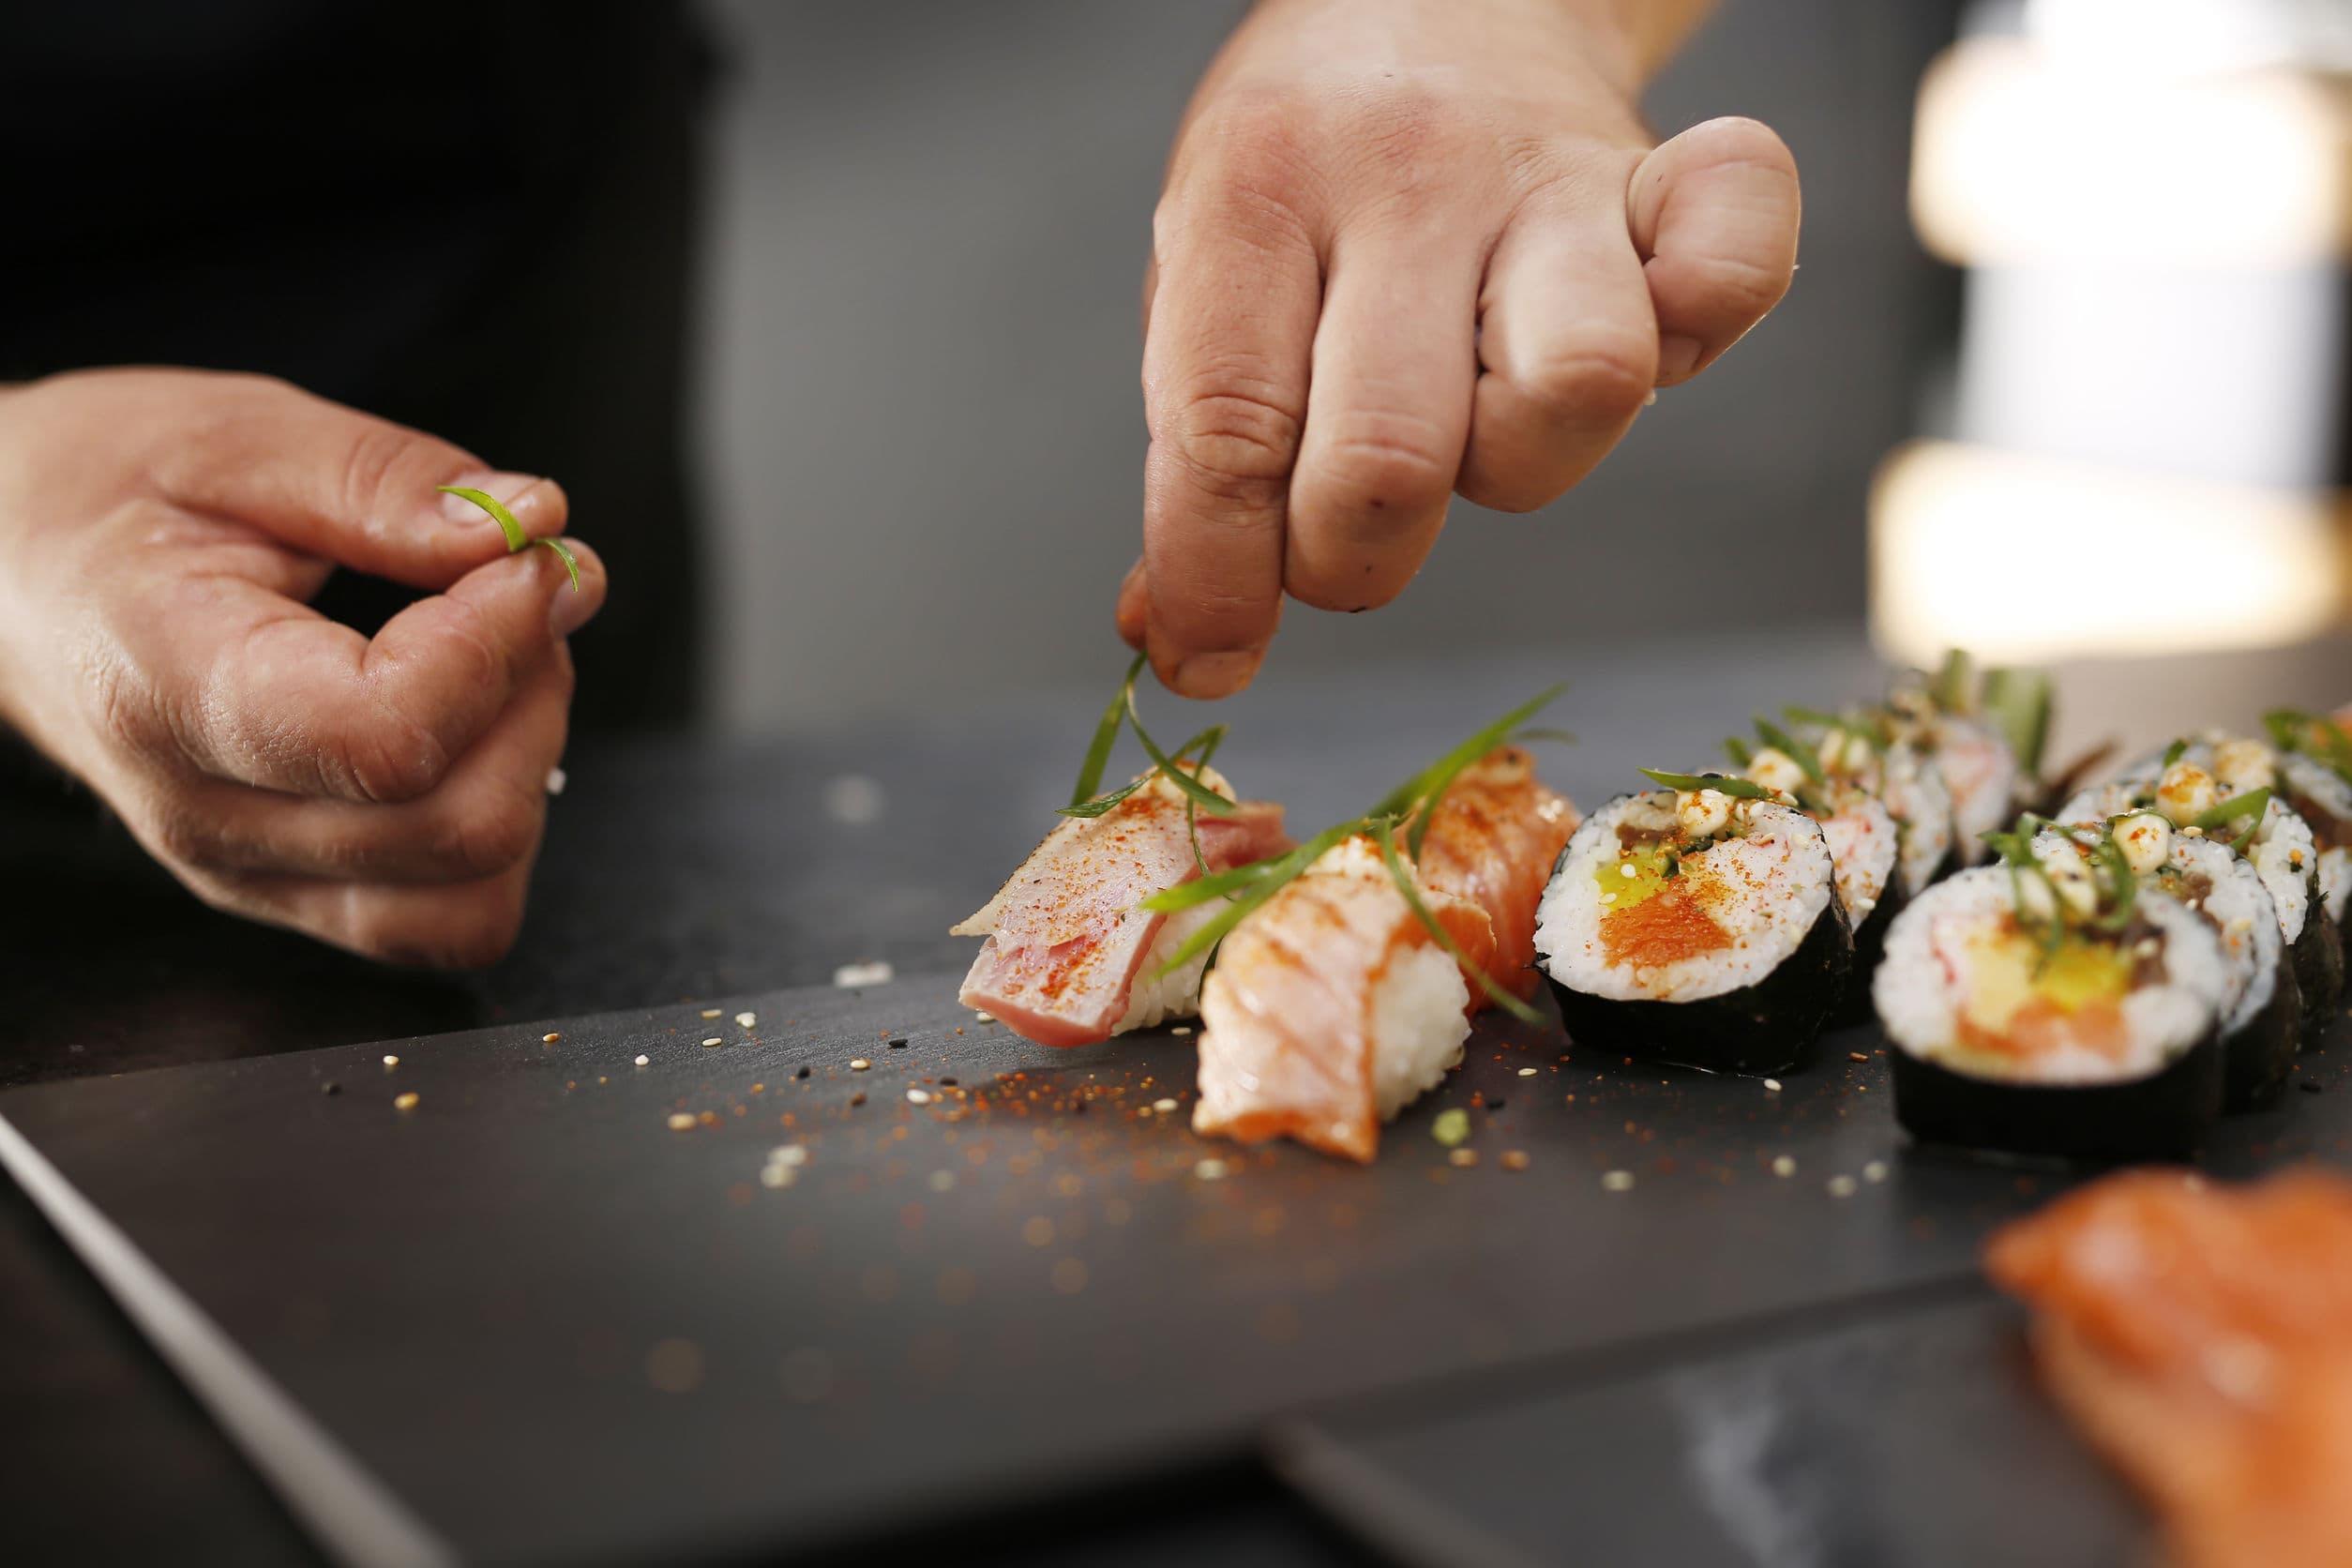 Sushi Restaurants Can Display New Menu Items